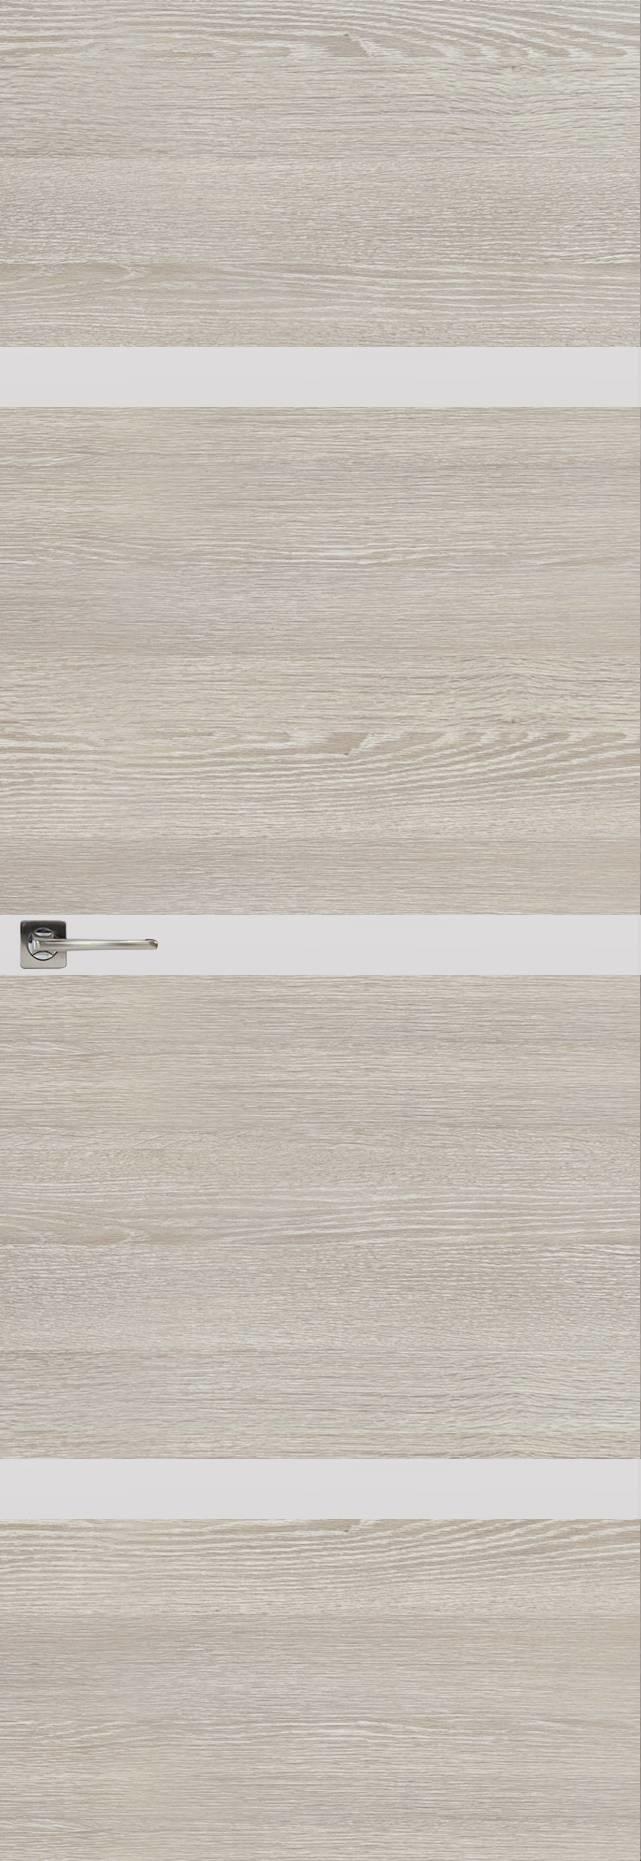 Tivoli Г-4 Невидимка цвет - Серый дуб Без стекла (ДГ)